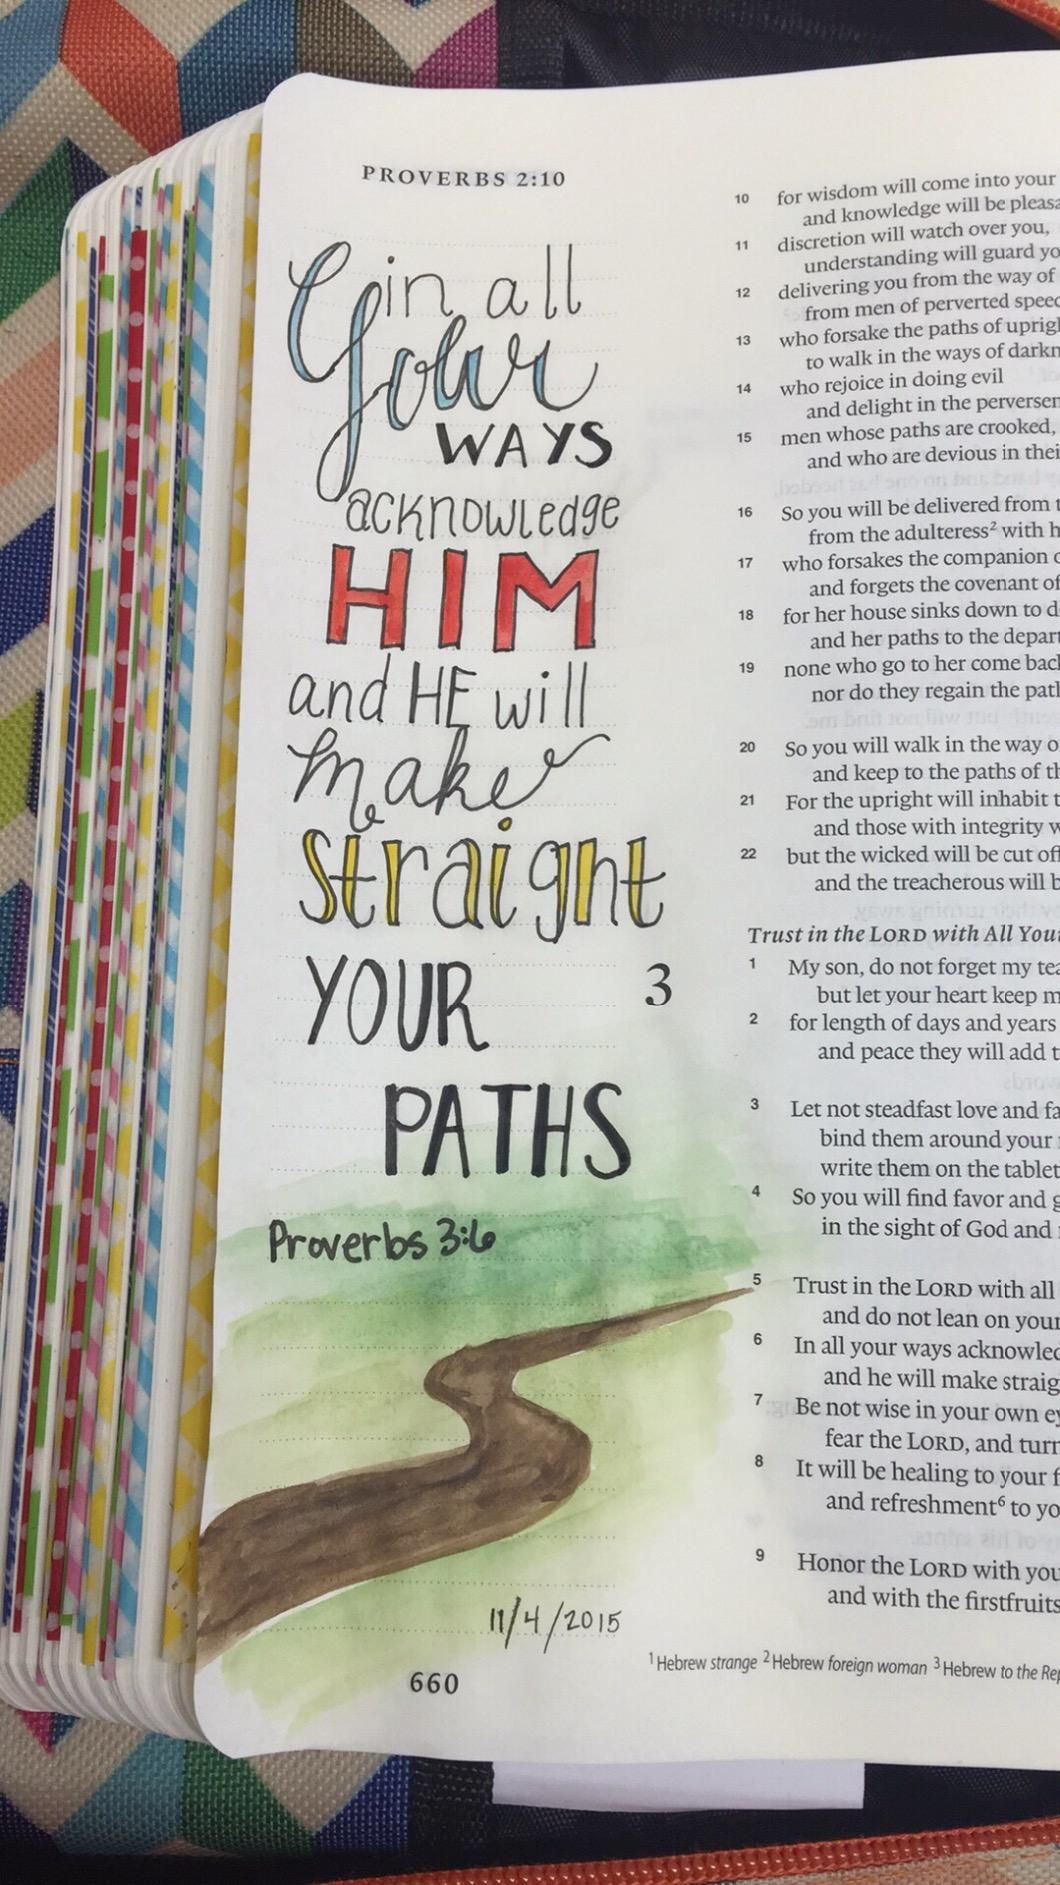 Verse by verse bible study audio book